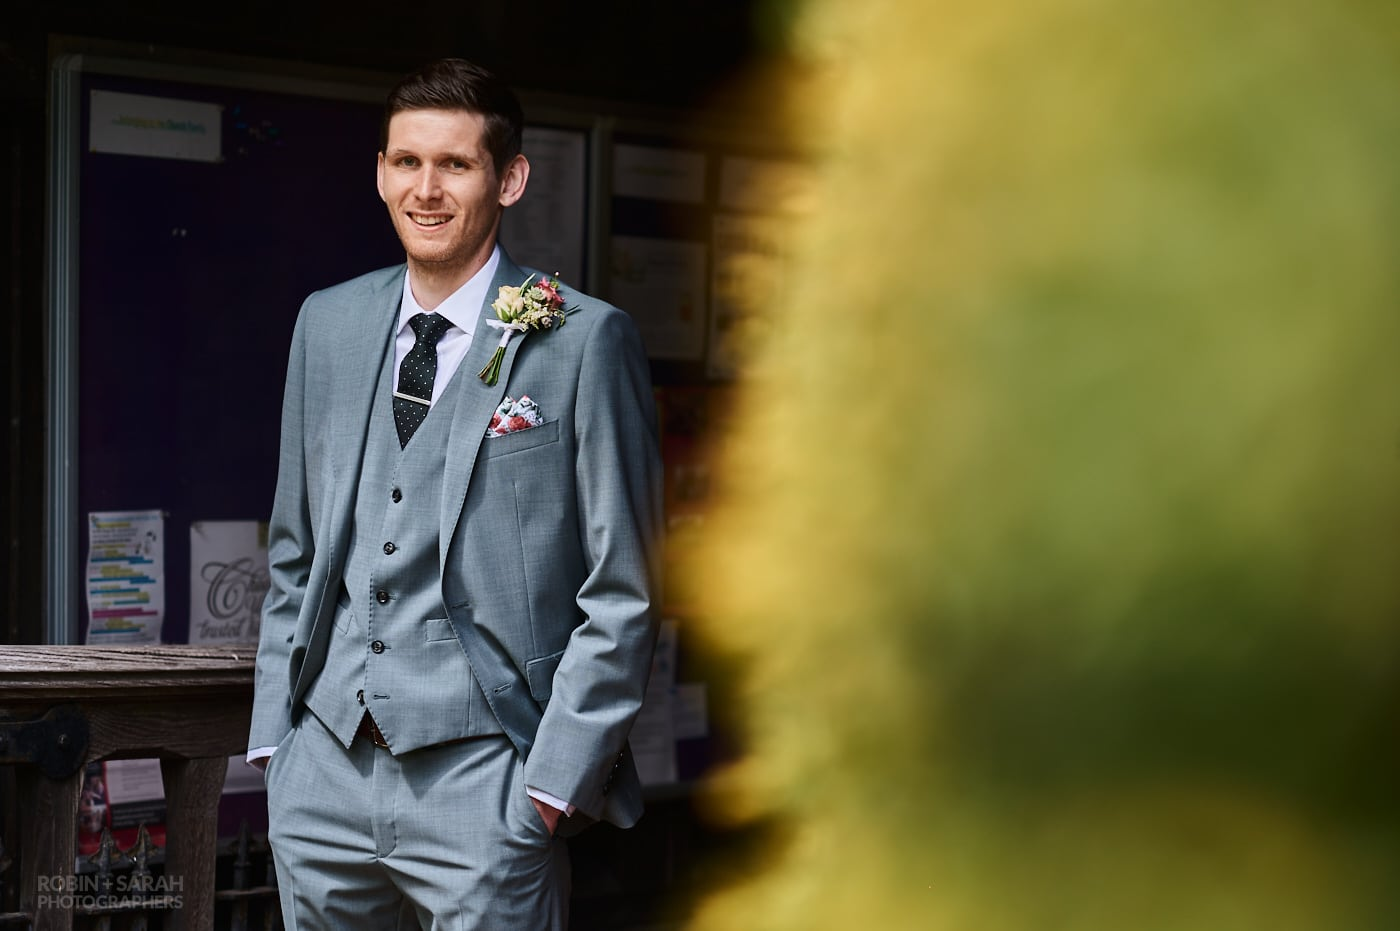 Portrait for groom at church wedding